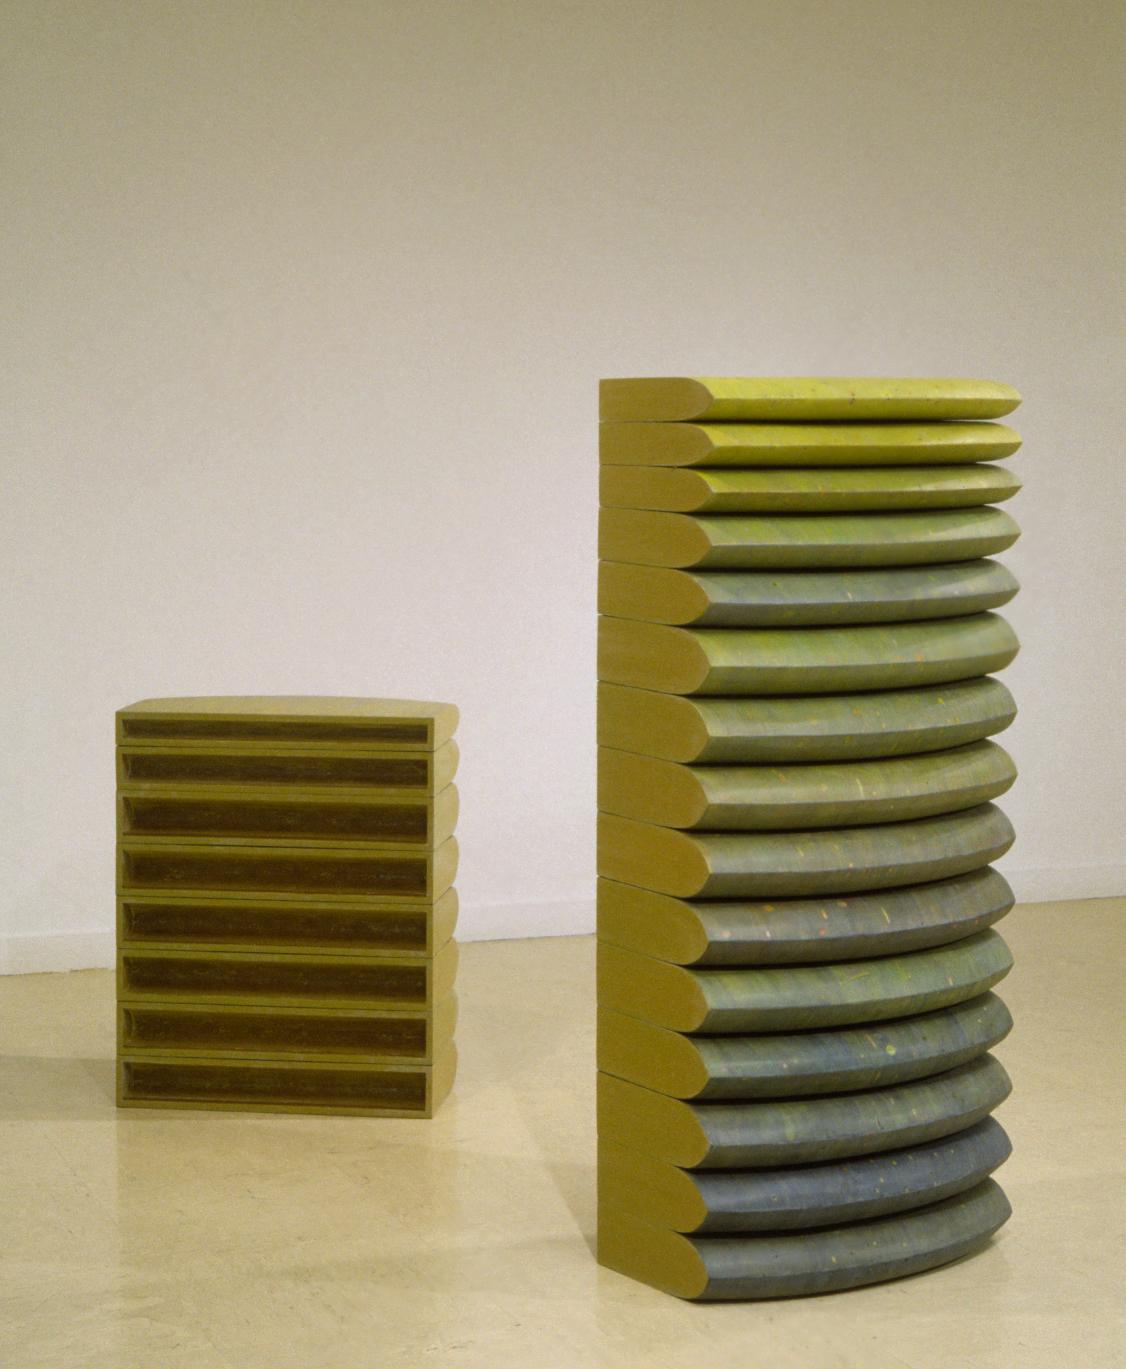 hive,  acrylic paint on cork, polyurethane, shaped MDF, 33 x 25 x 12; 58 x 25 x 12, Cranbrook Art Museum, 1999